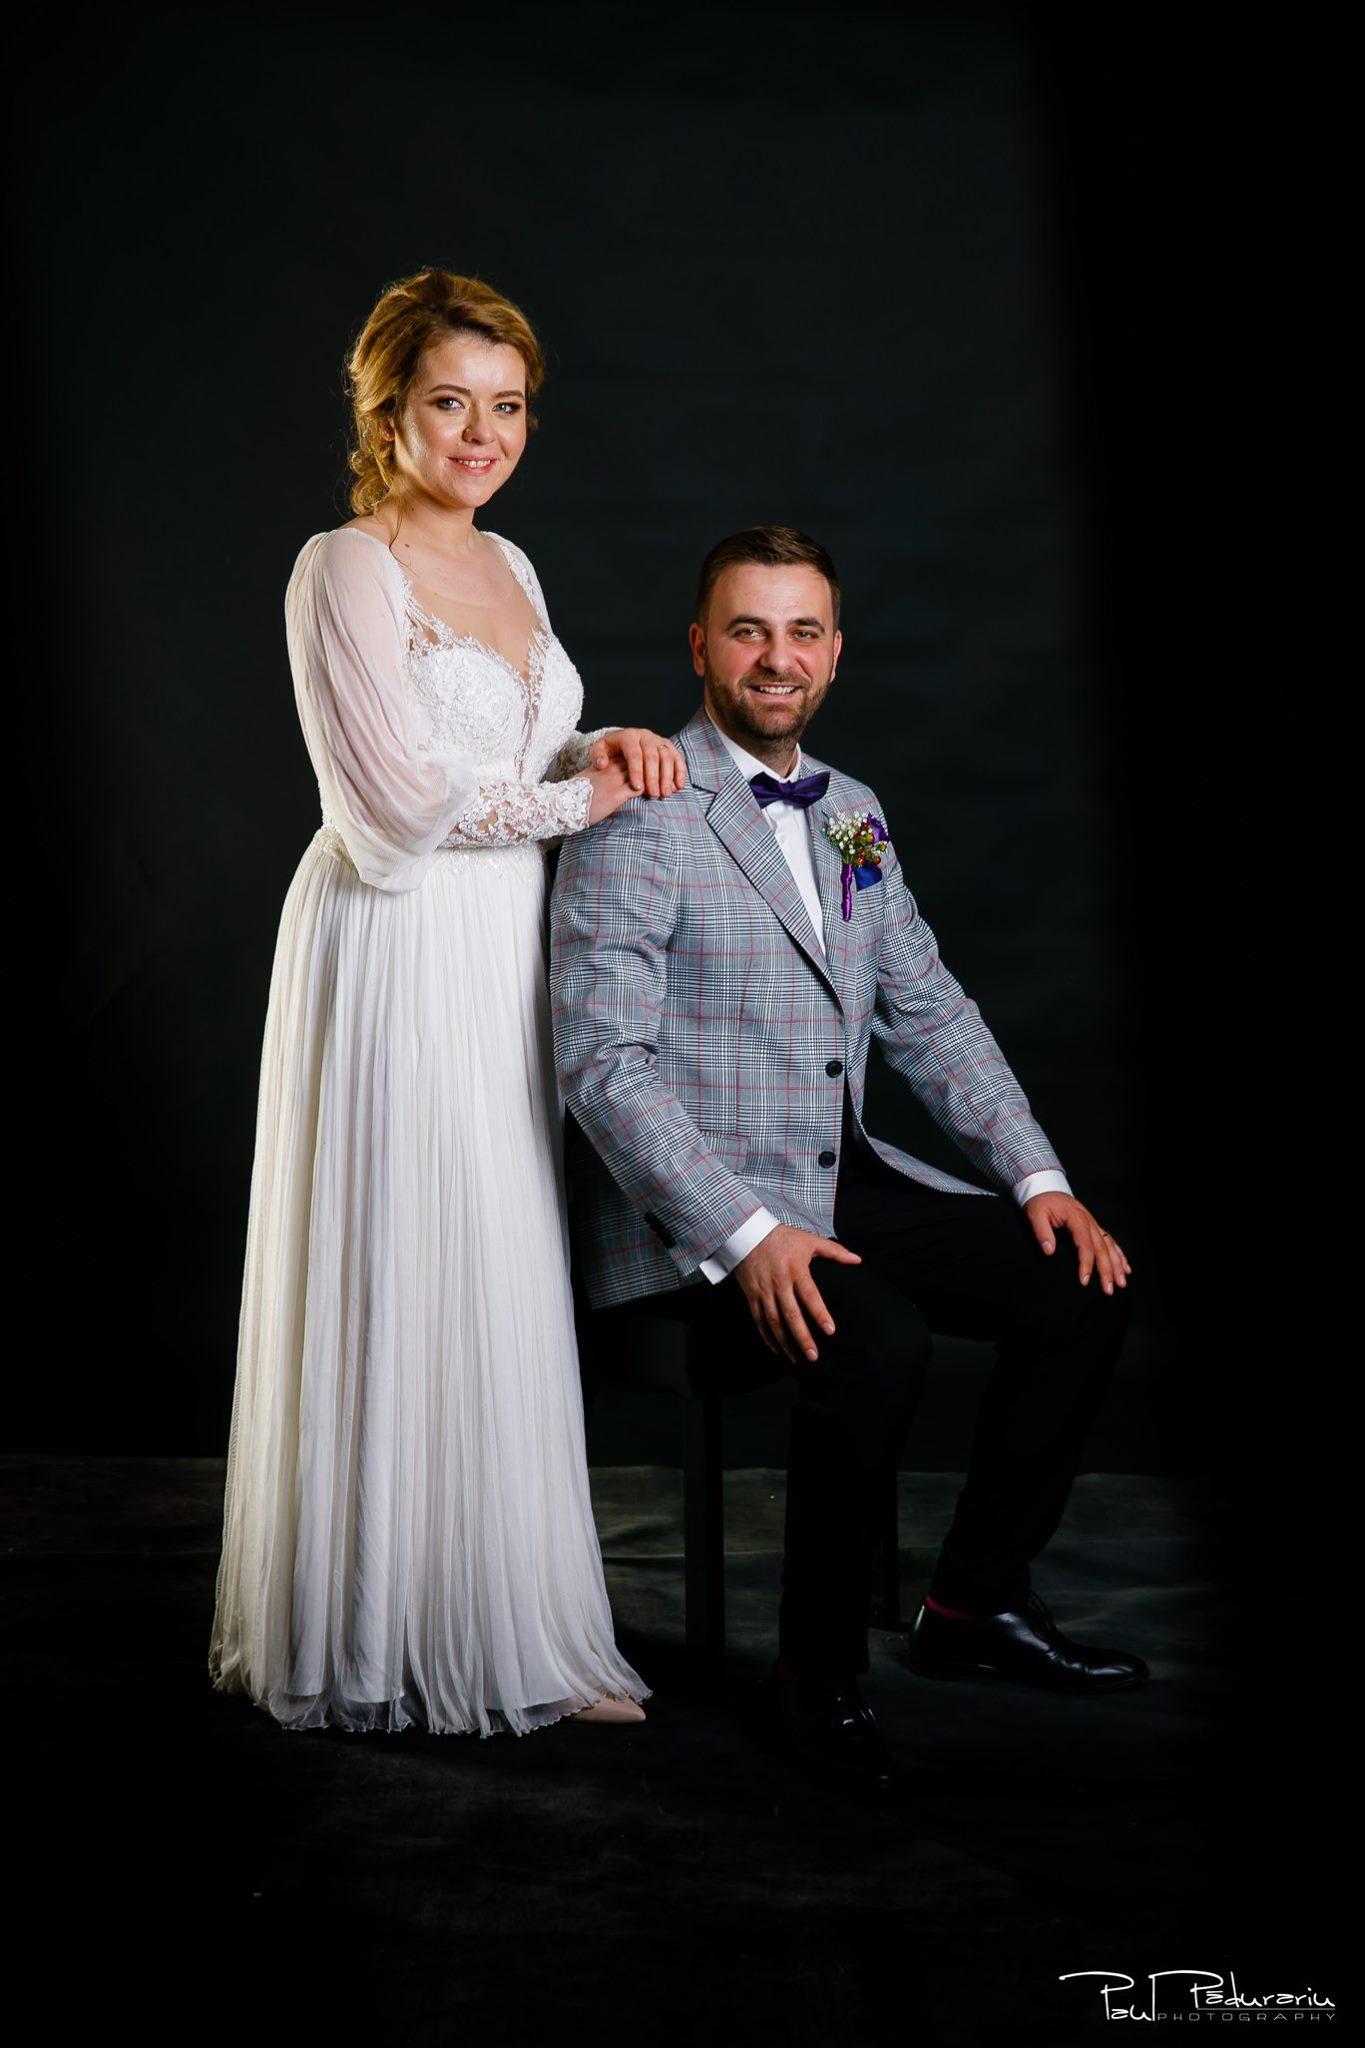 Adriana si Ionut sedinta foto nunta iasi fotograf profesionist paul padurariu 2019 8